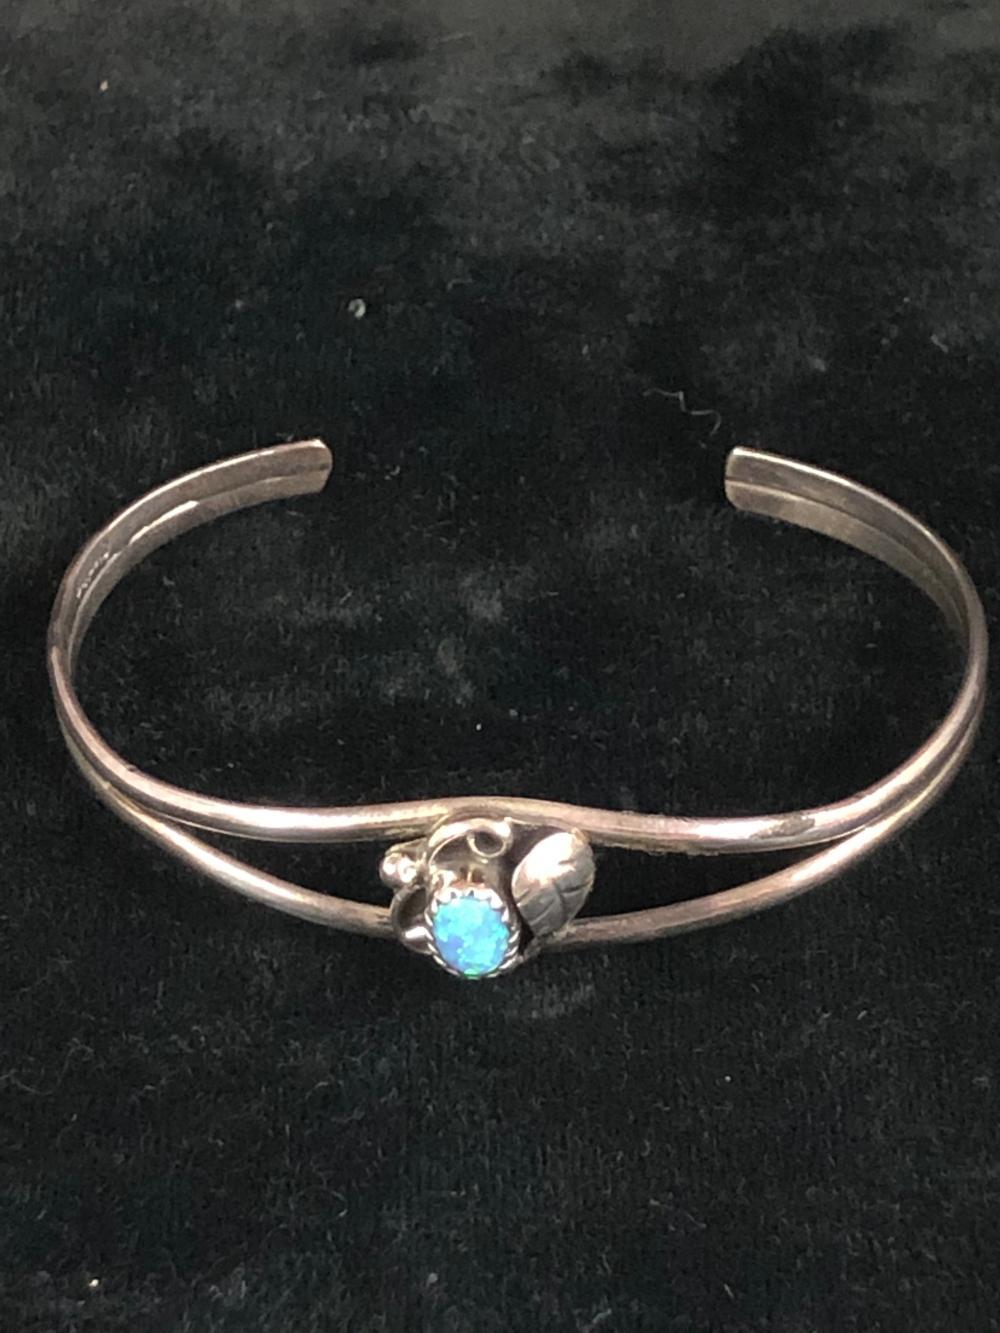 Cultured blue opal sterling silver cuff bracelet